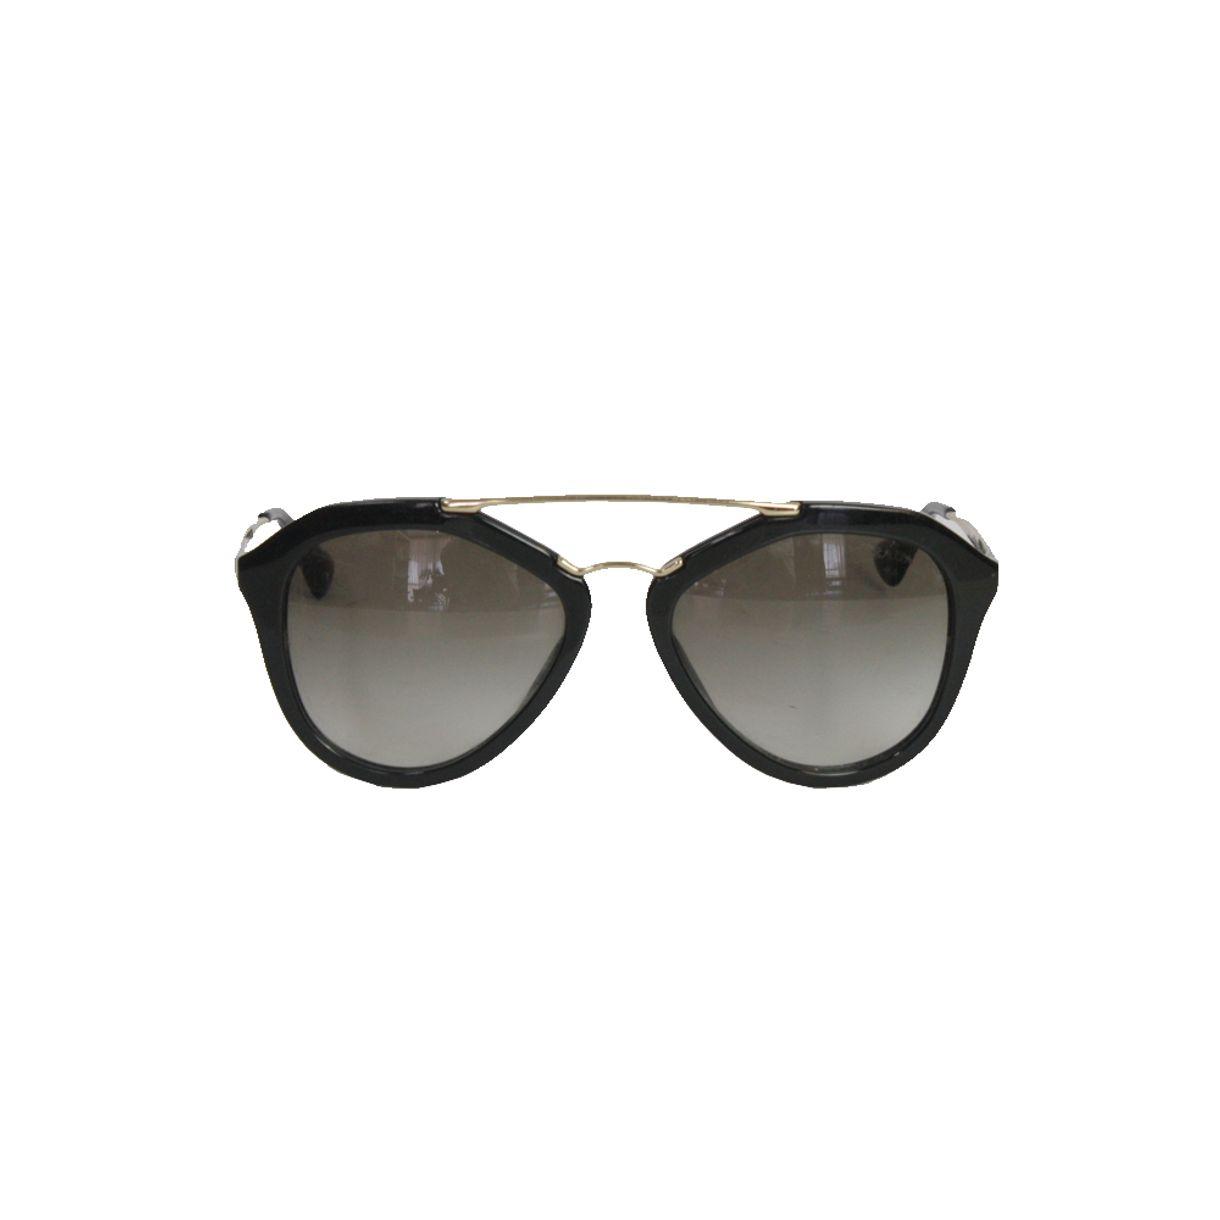 Oculos-Louis-Vuitton-Evidence-Preto